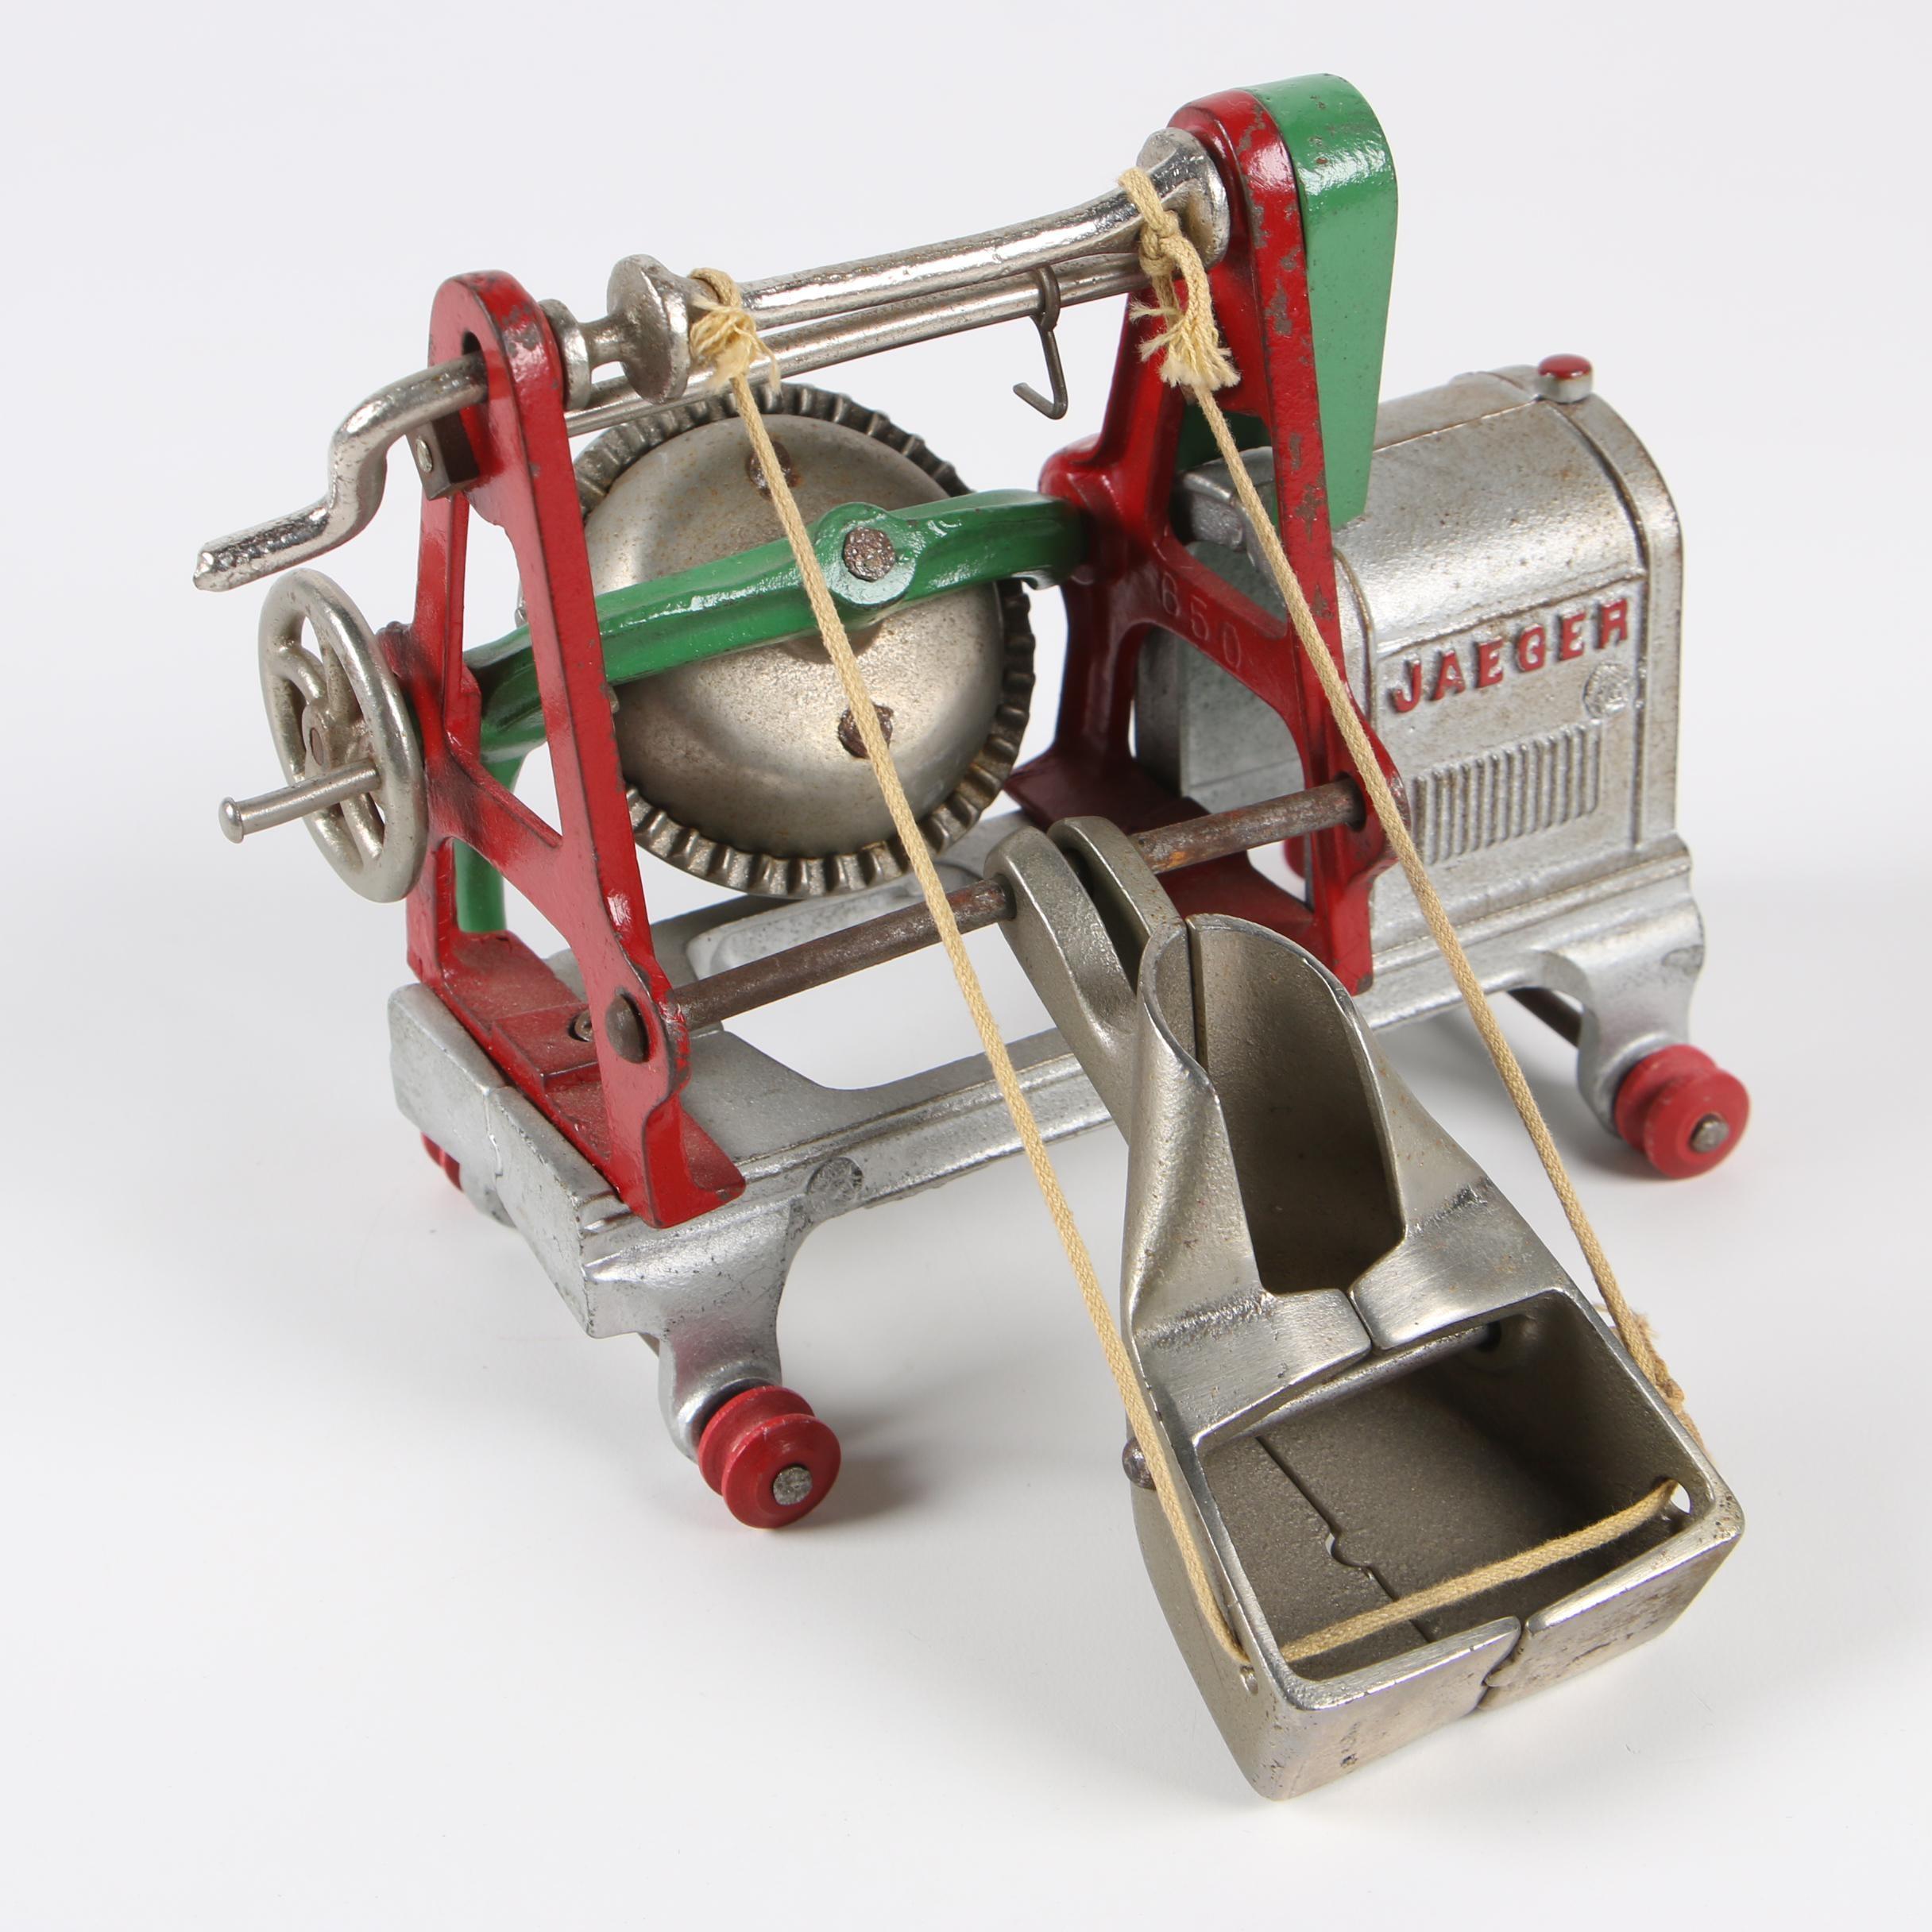 Kenton Toys Cast Iron Jaeger Cement Mixer, 1930s